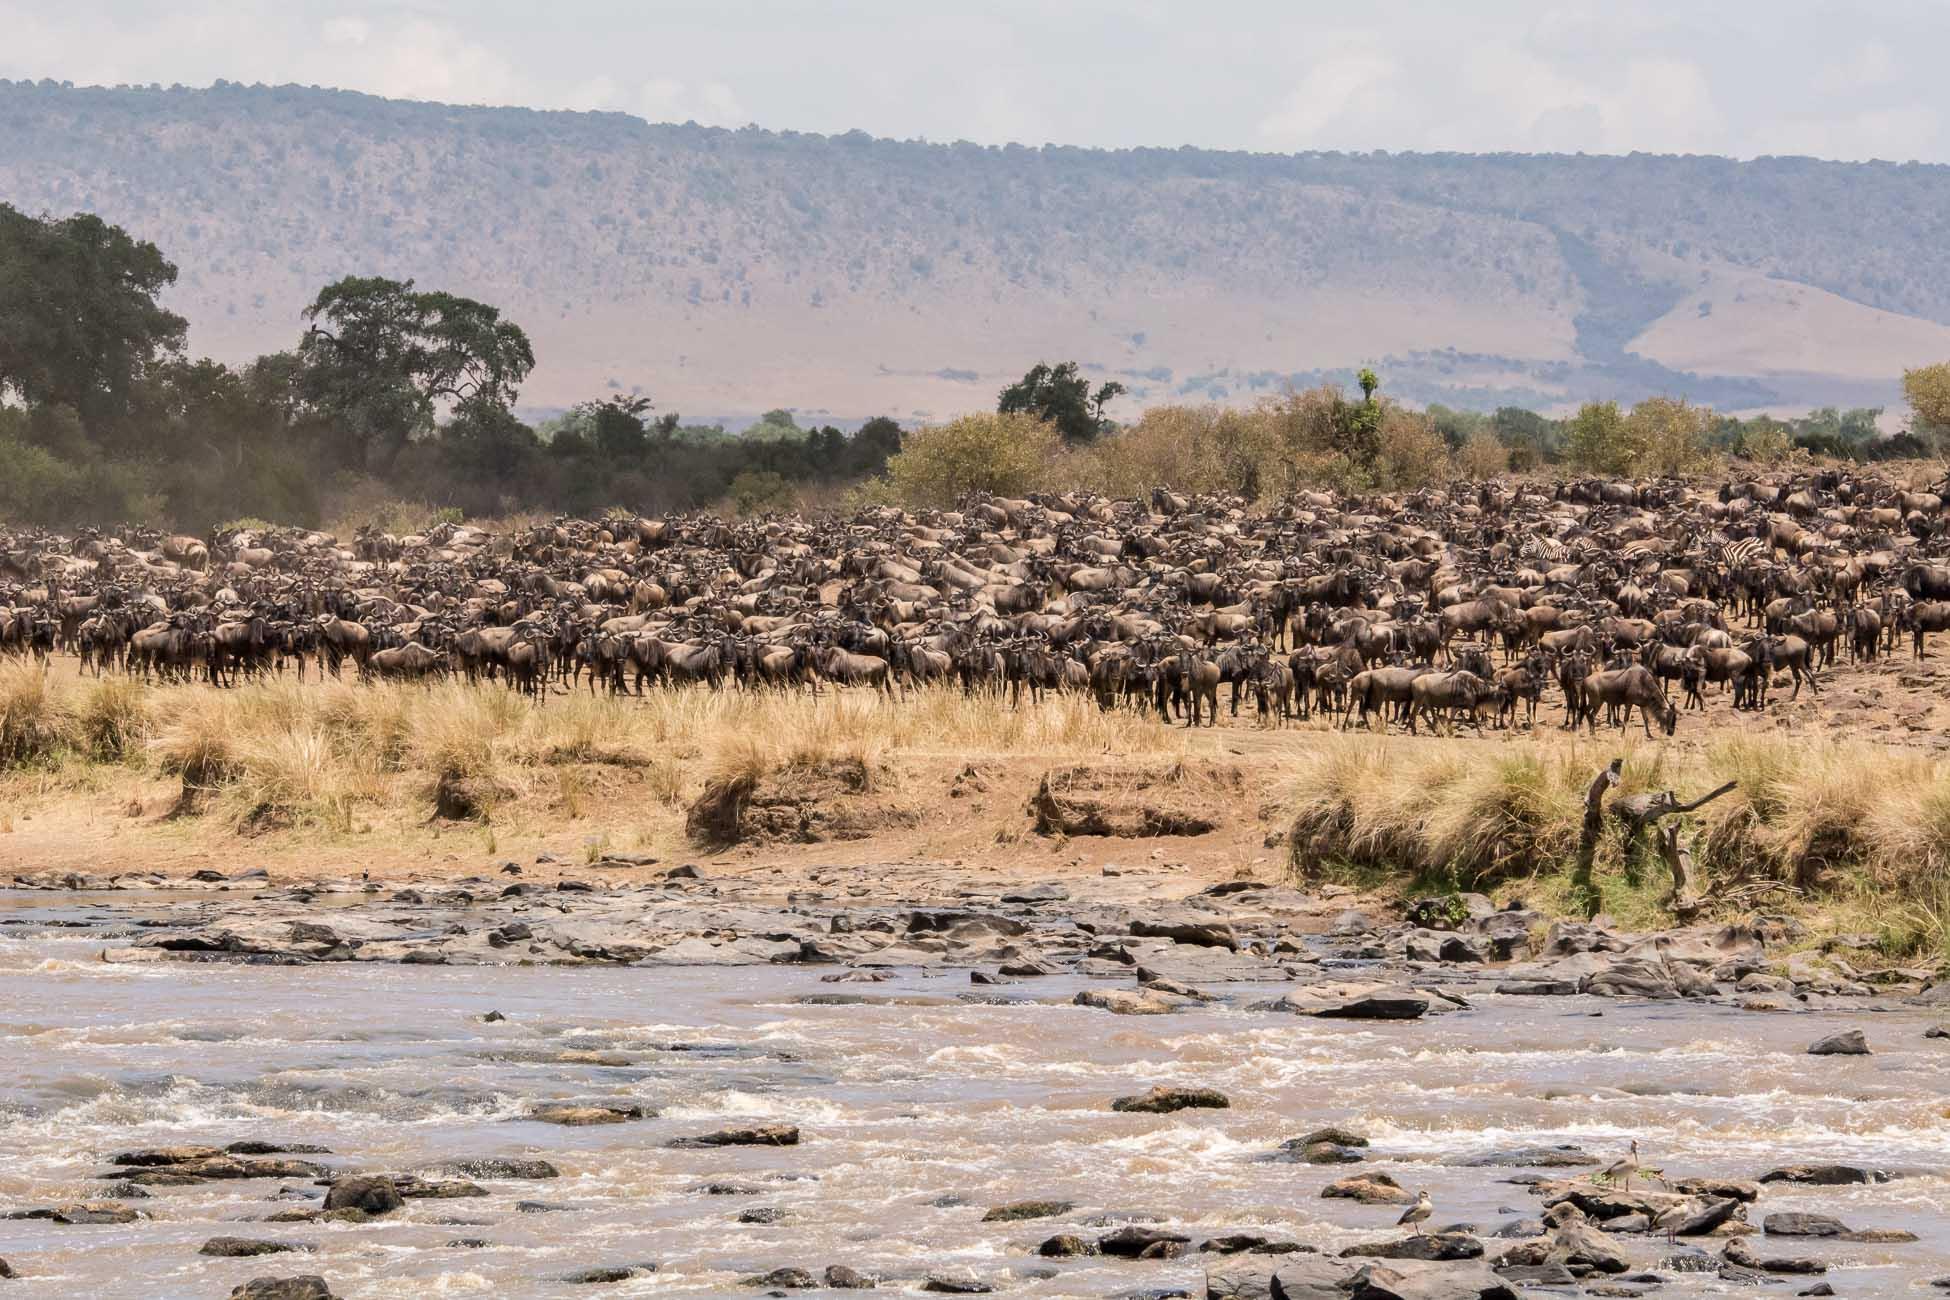 Big Migration Kenia Grosse Tierwanderung Gnus